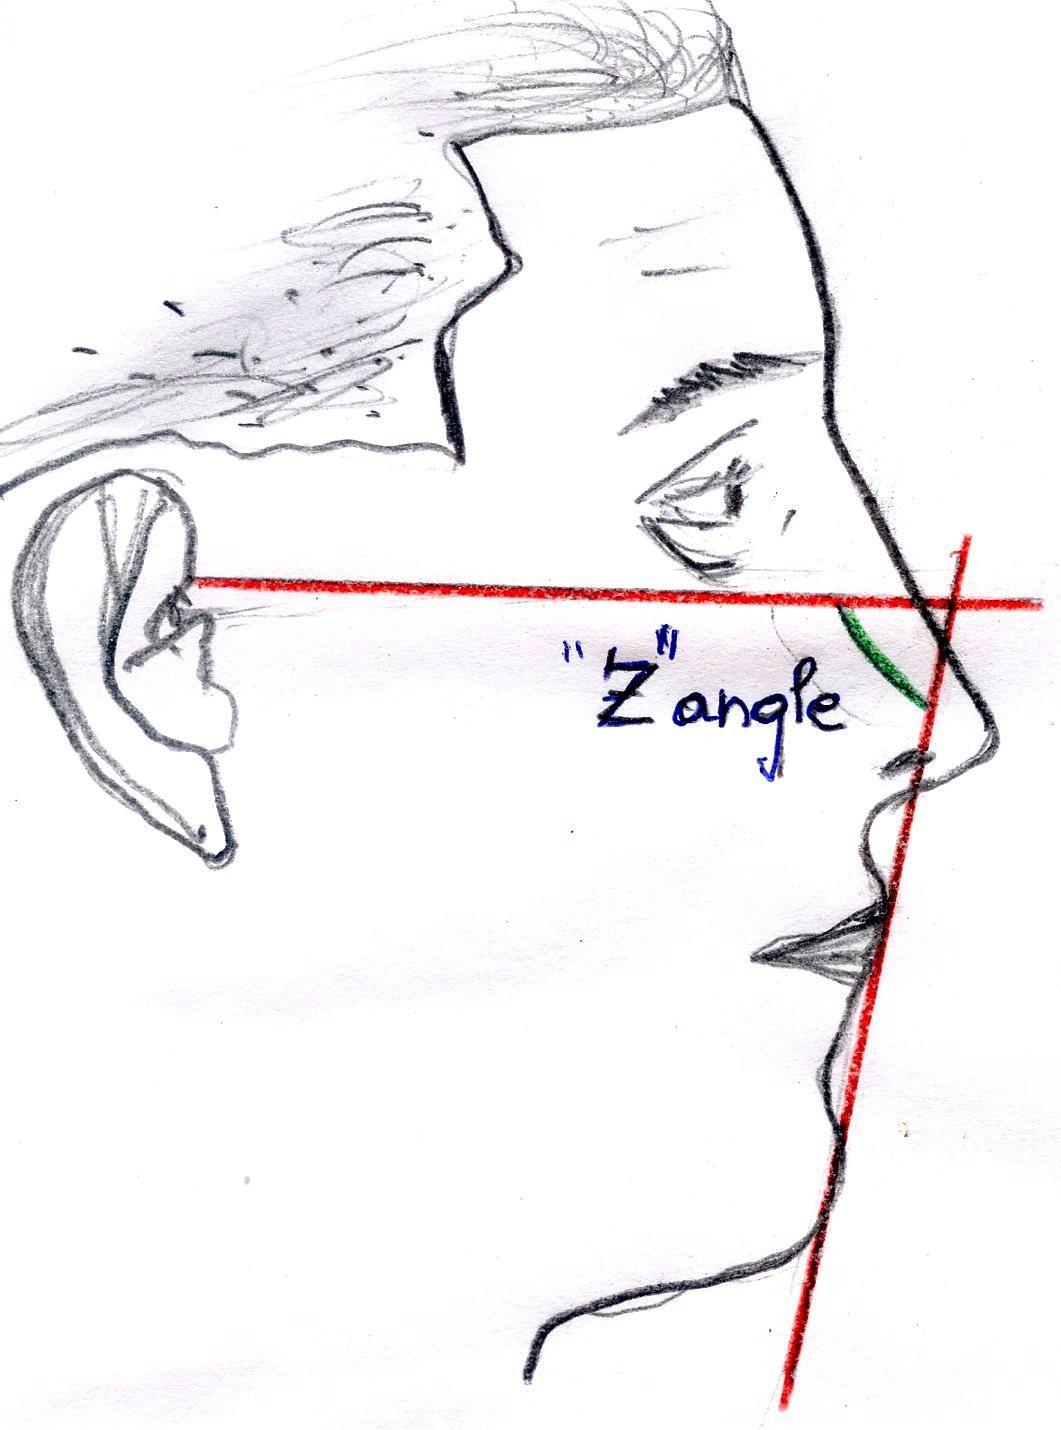 MCQ's in Facial Plastic & Reconstructive Surgery